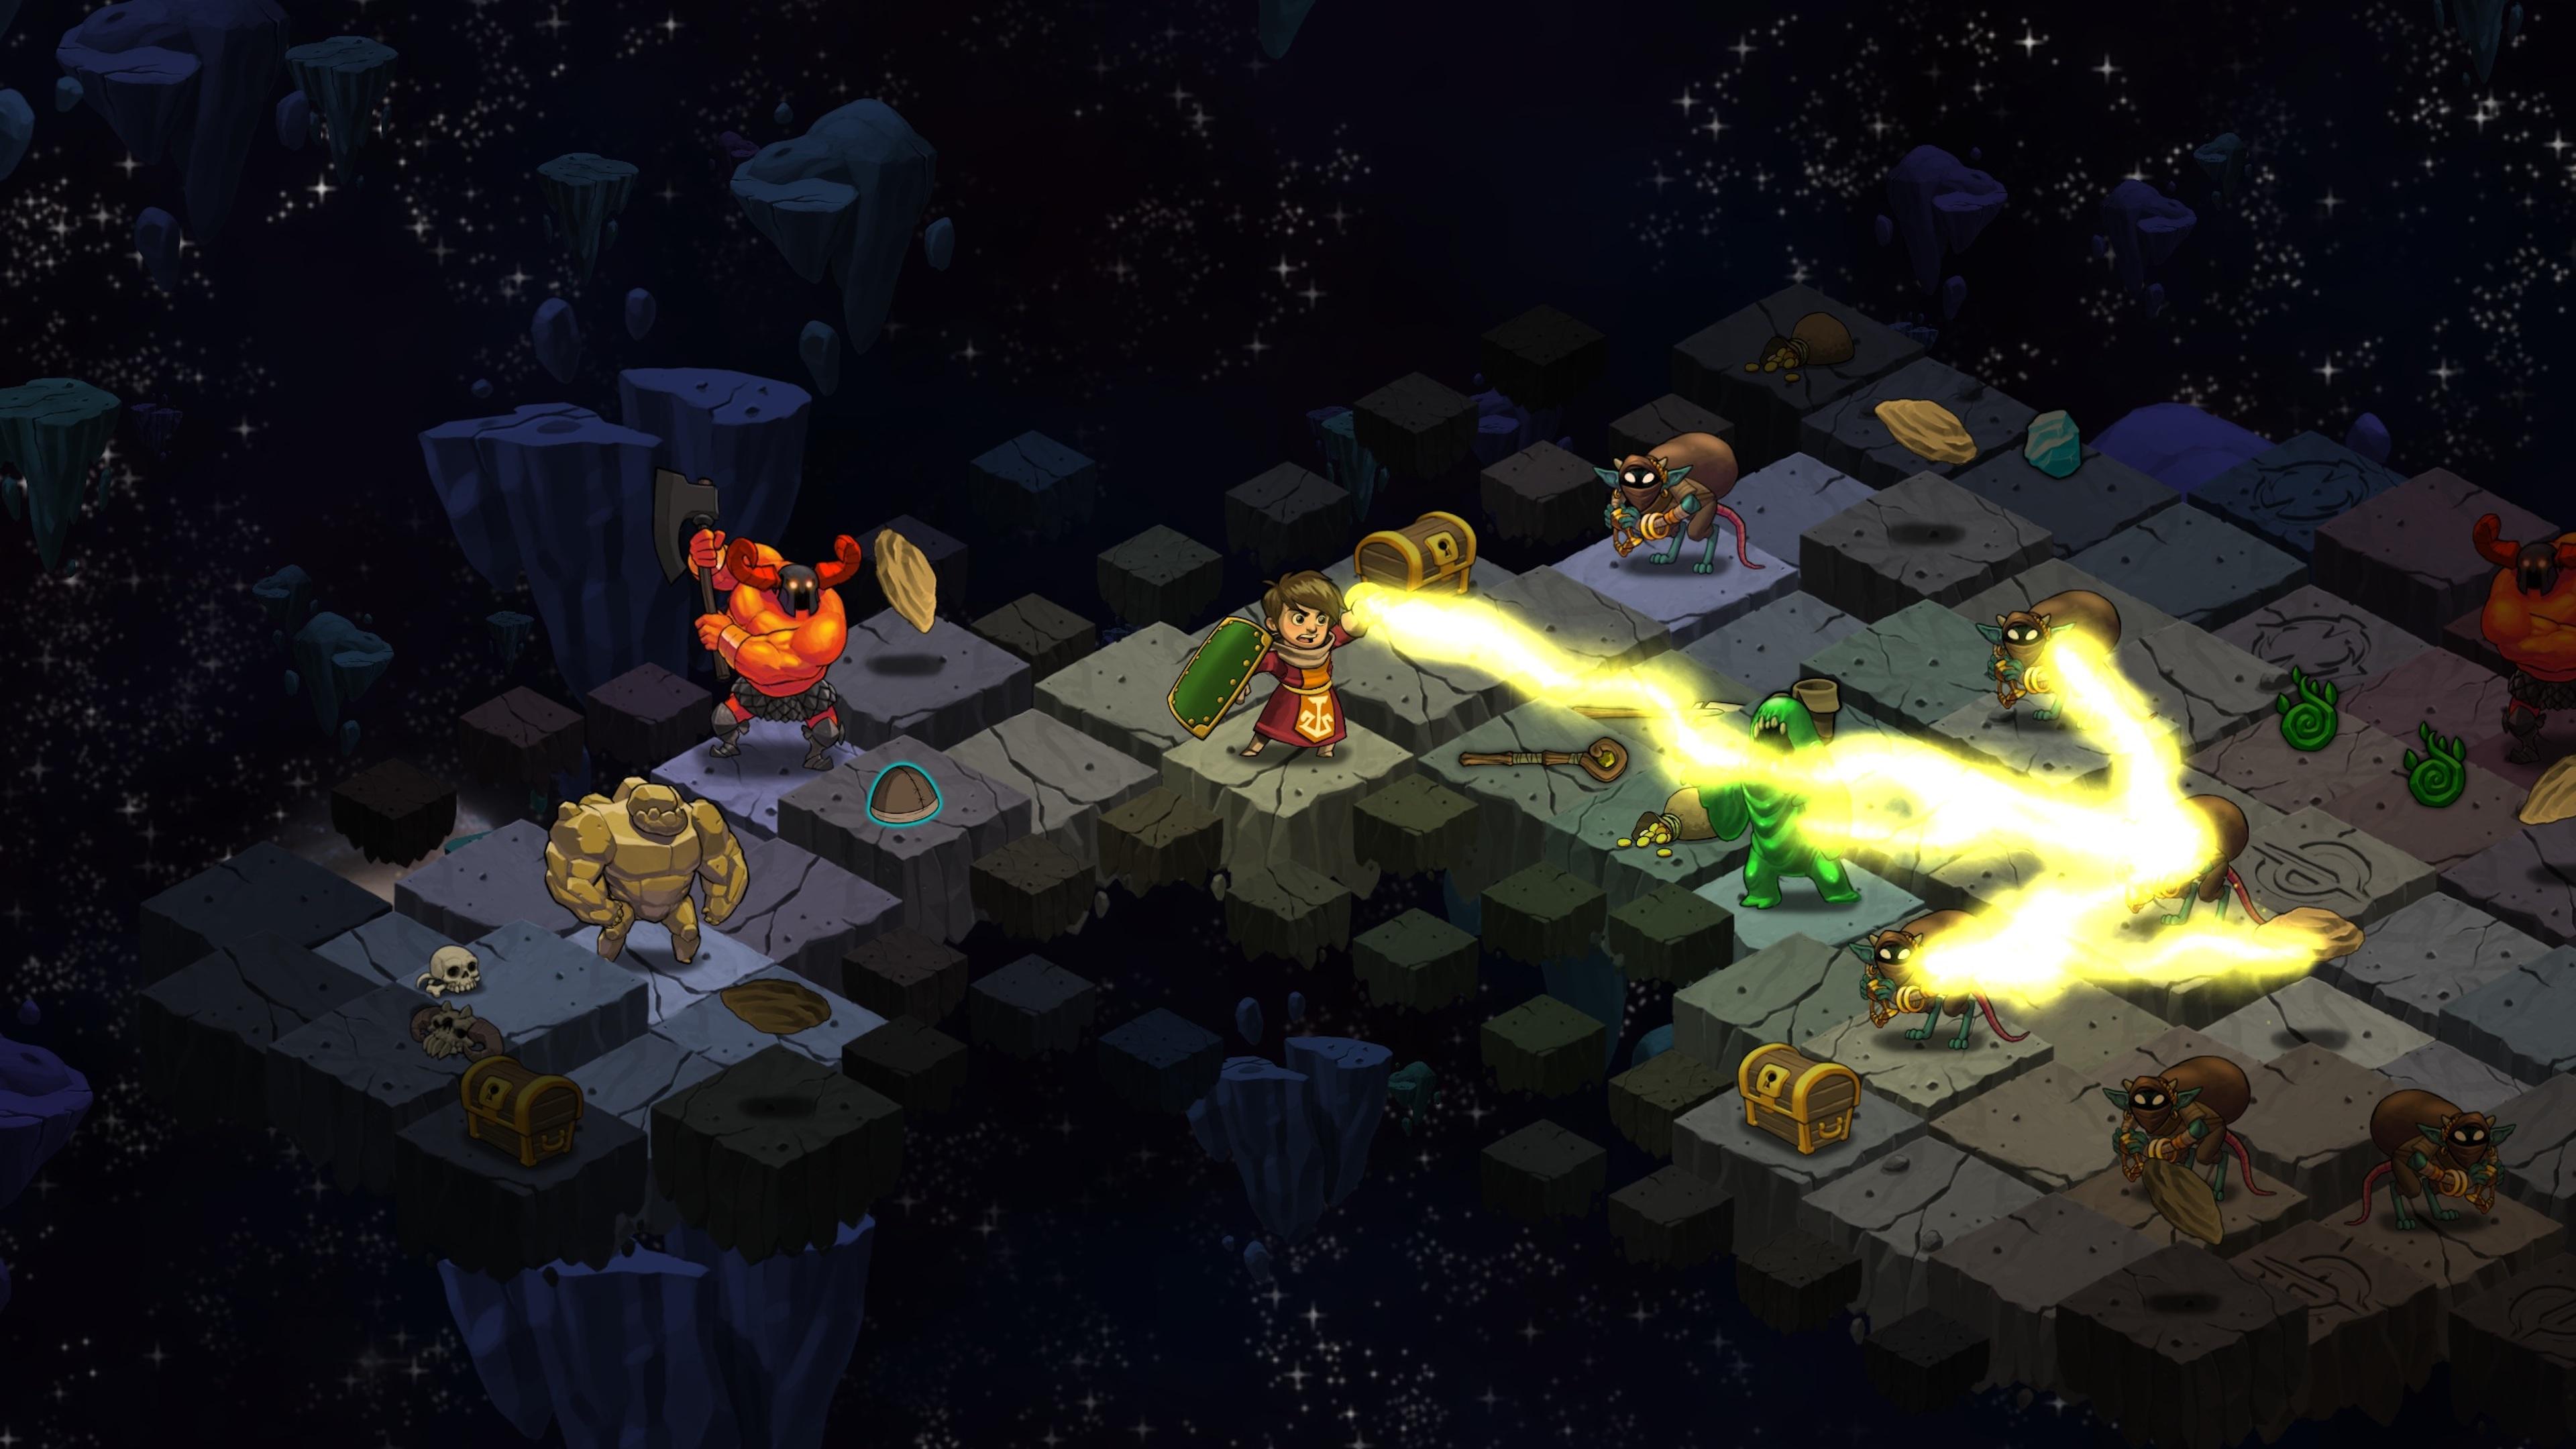 Скриншот №1 к Волшебники-разбойники Rogue Wizards